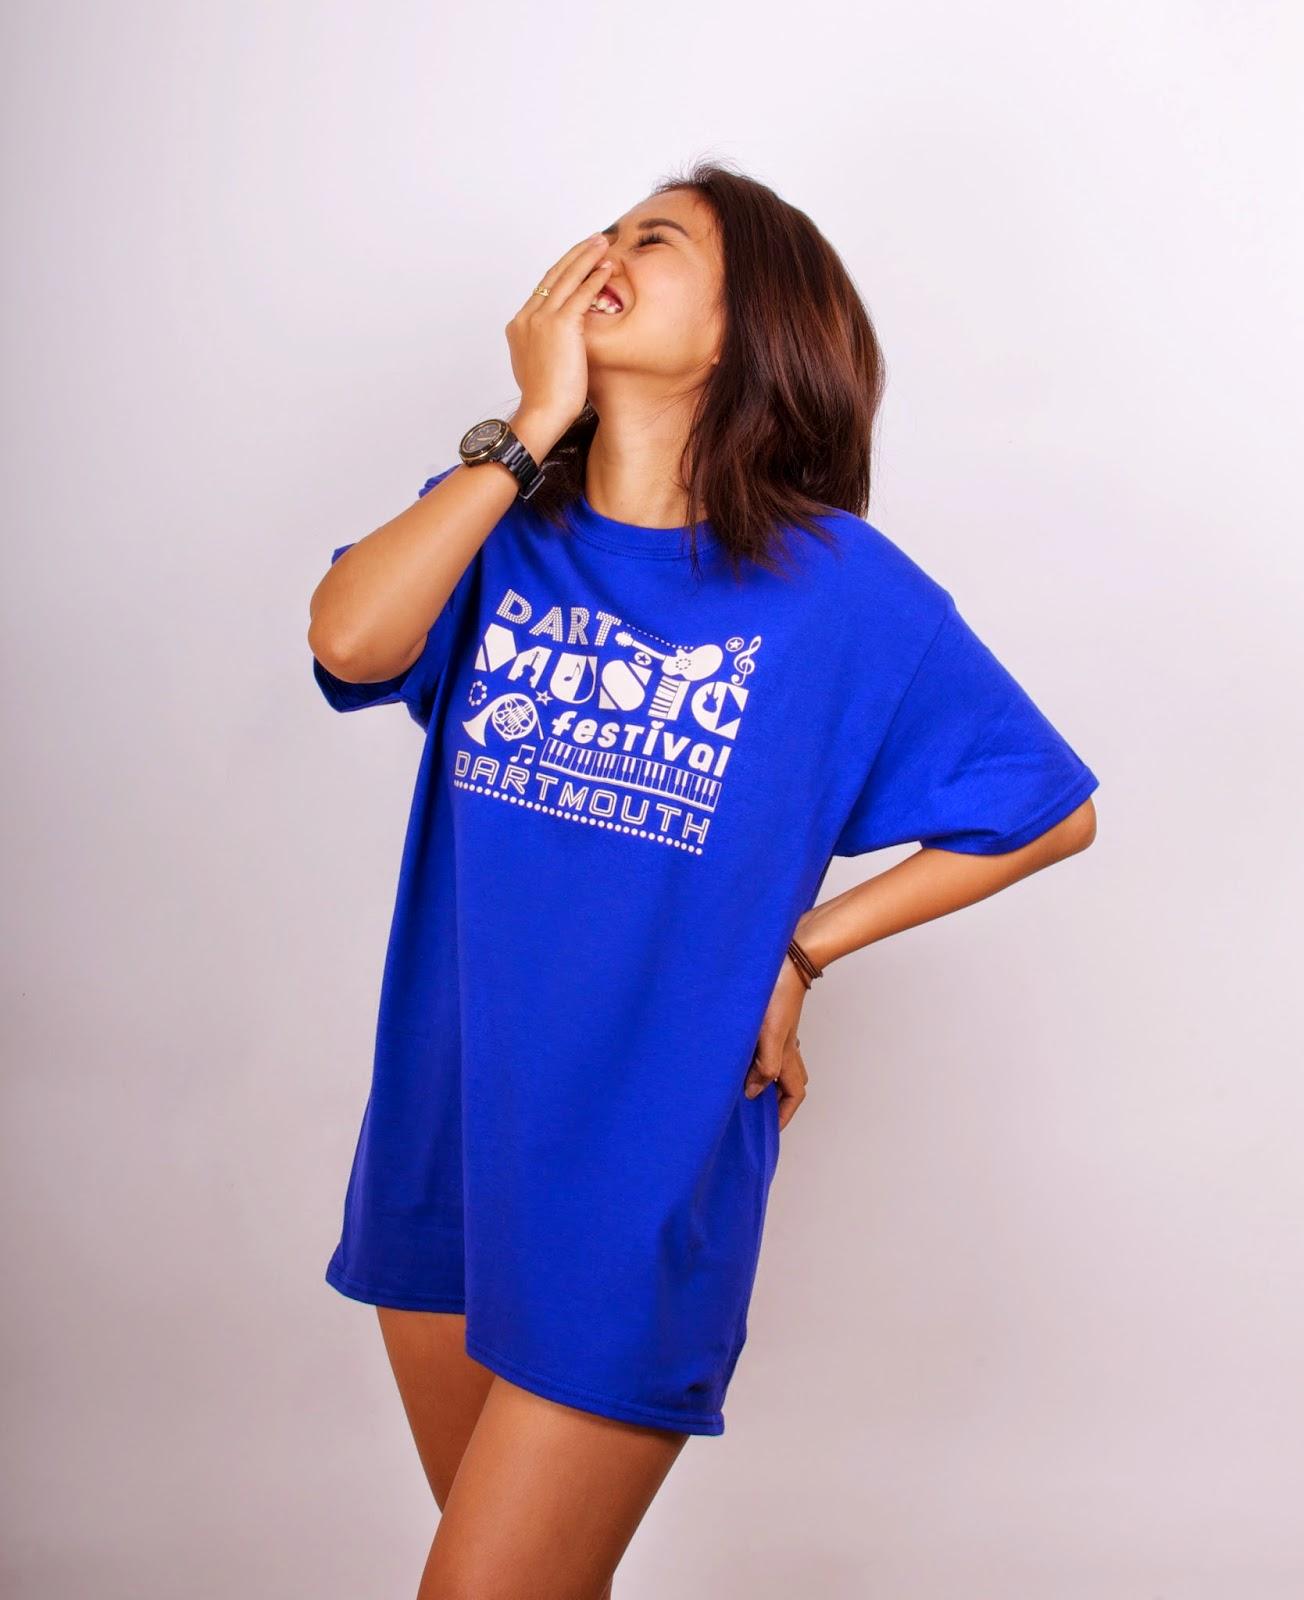 New T Shirts Galore Dart Music Festival Dart Music Festival